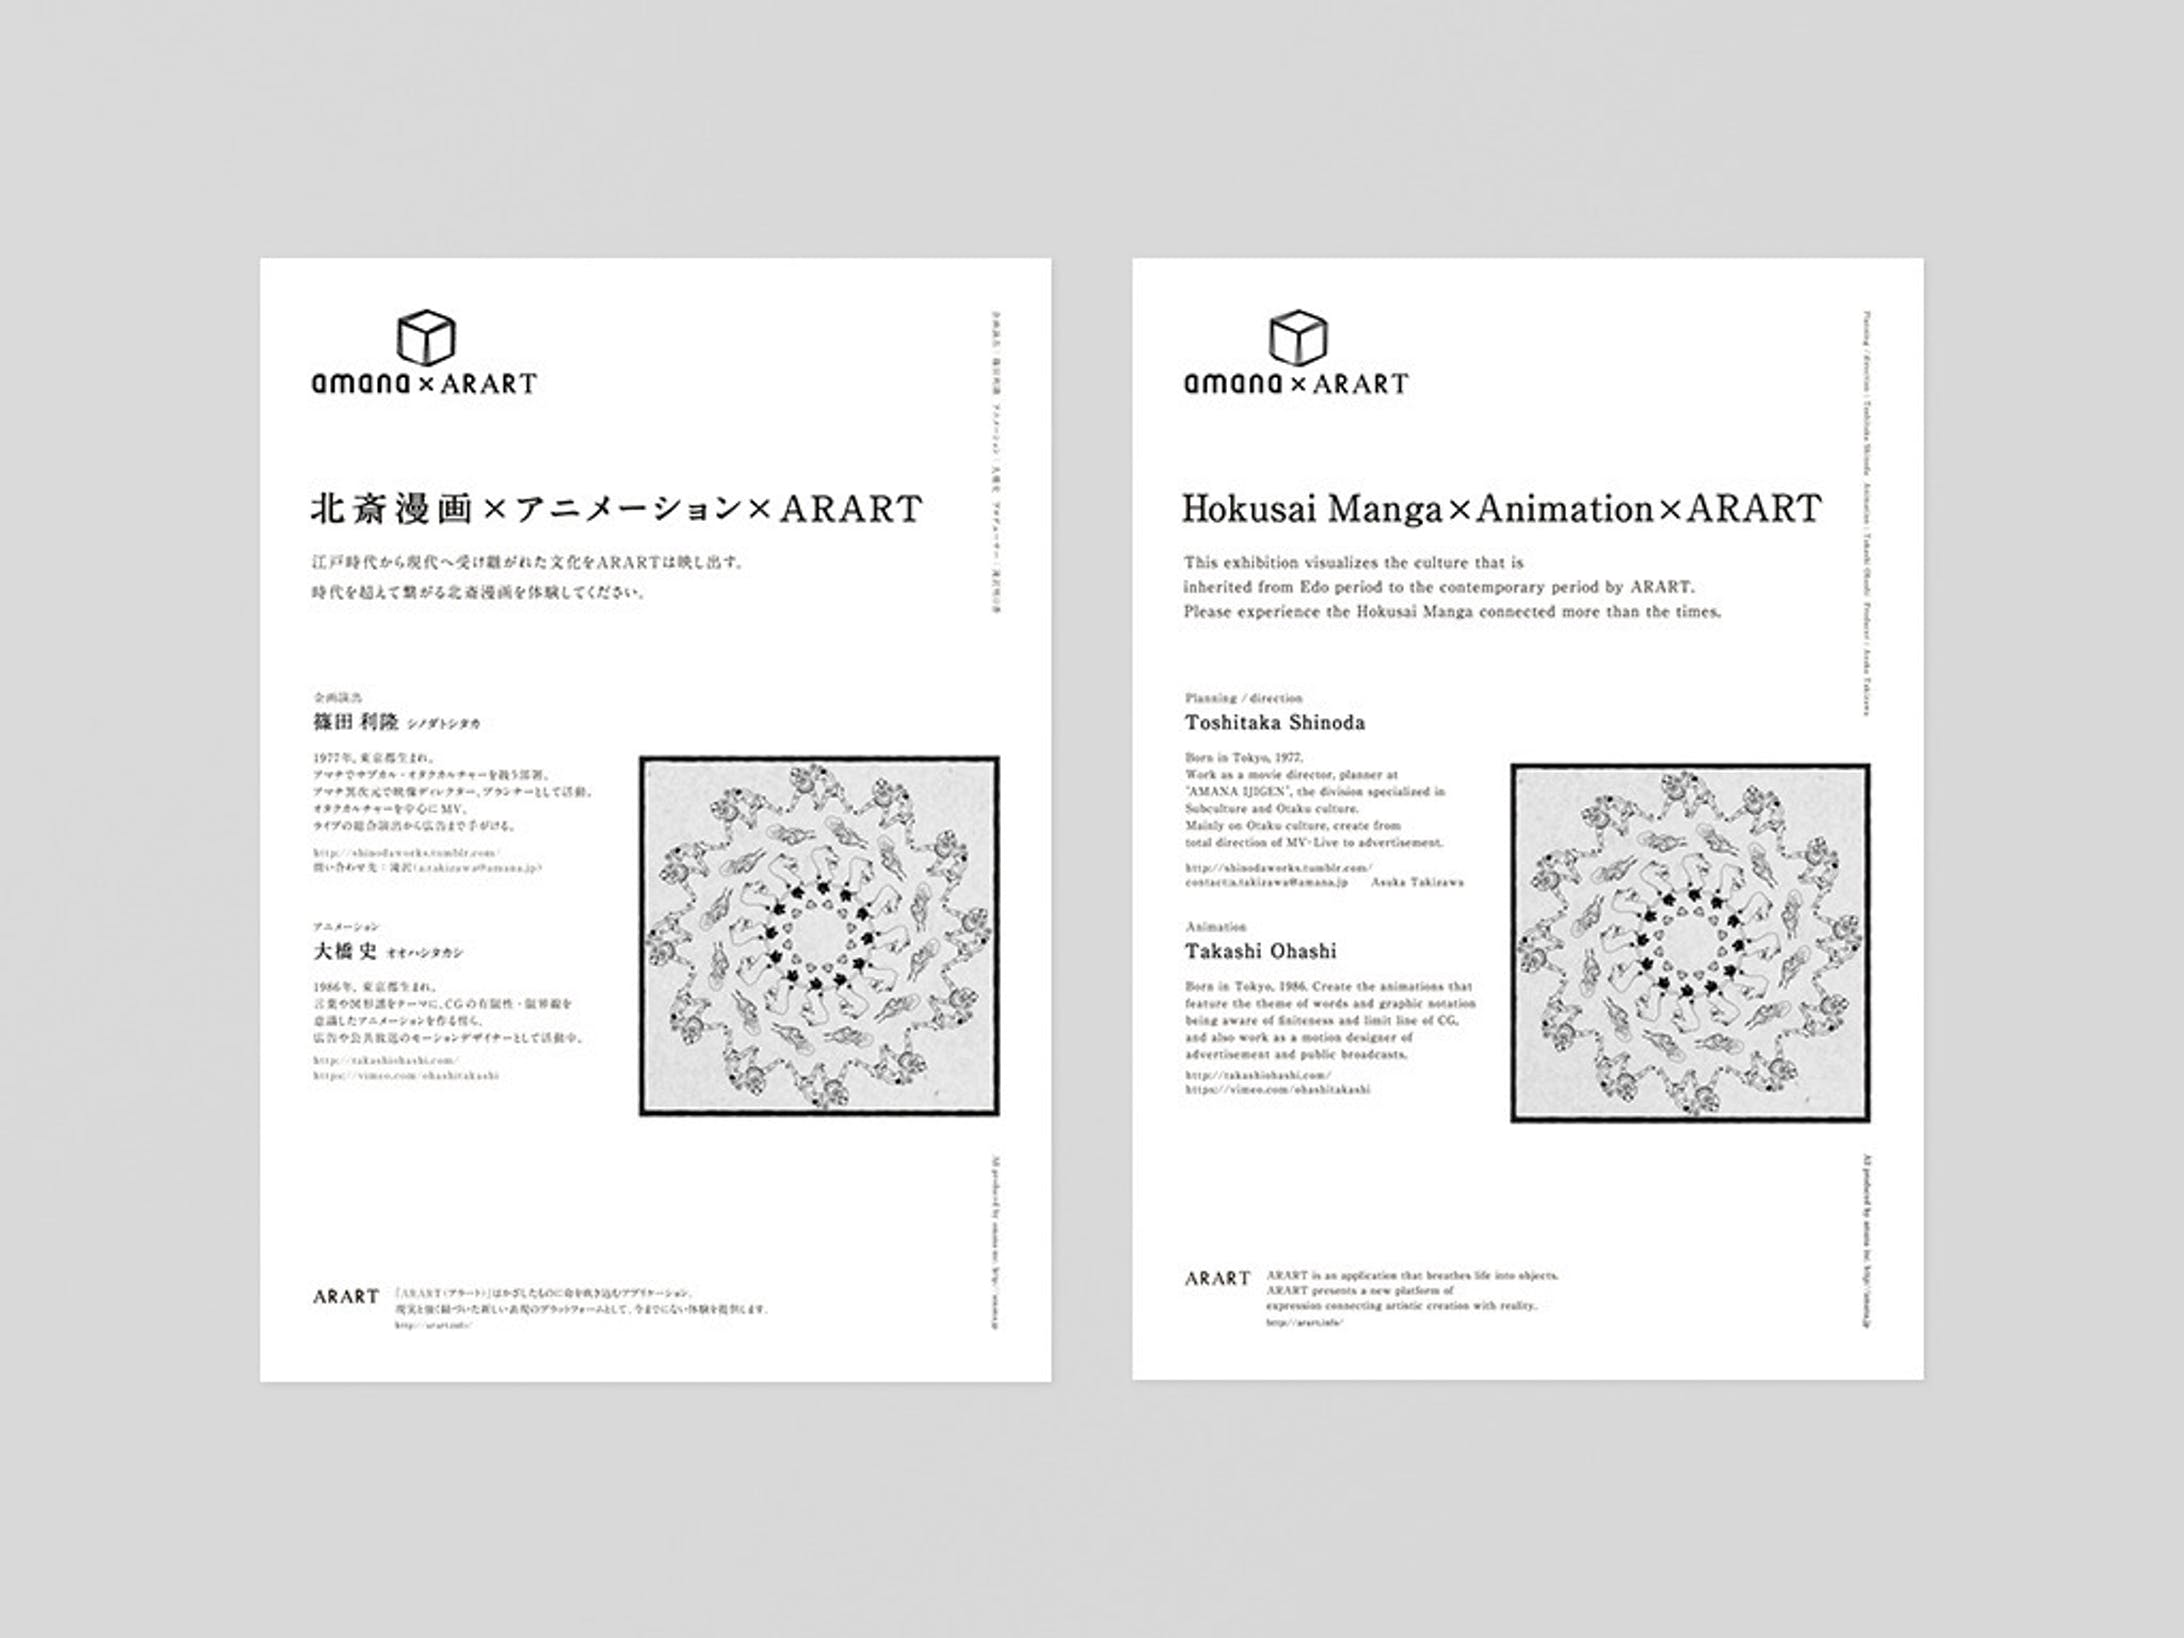 amana x ARART : 北斎漫画 x アニメーション x ARART-1